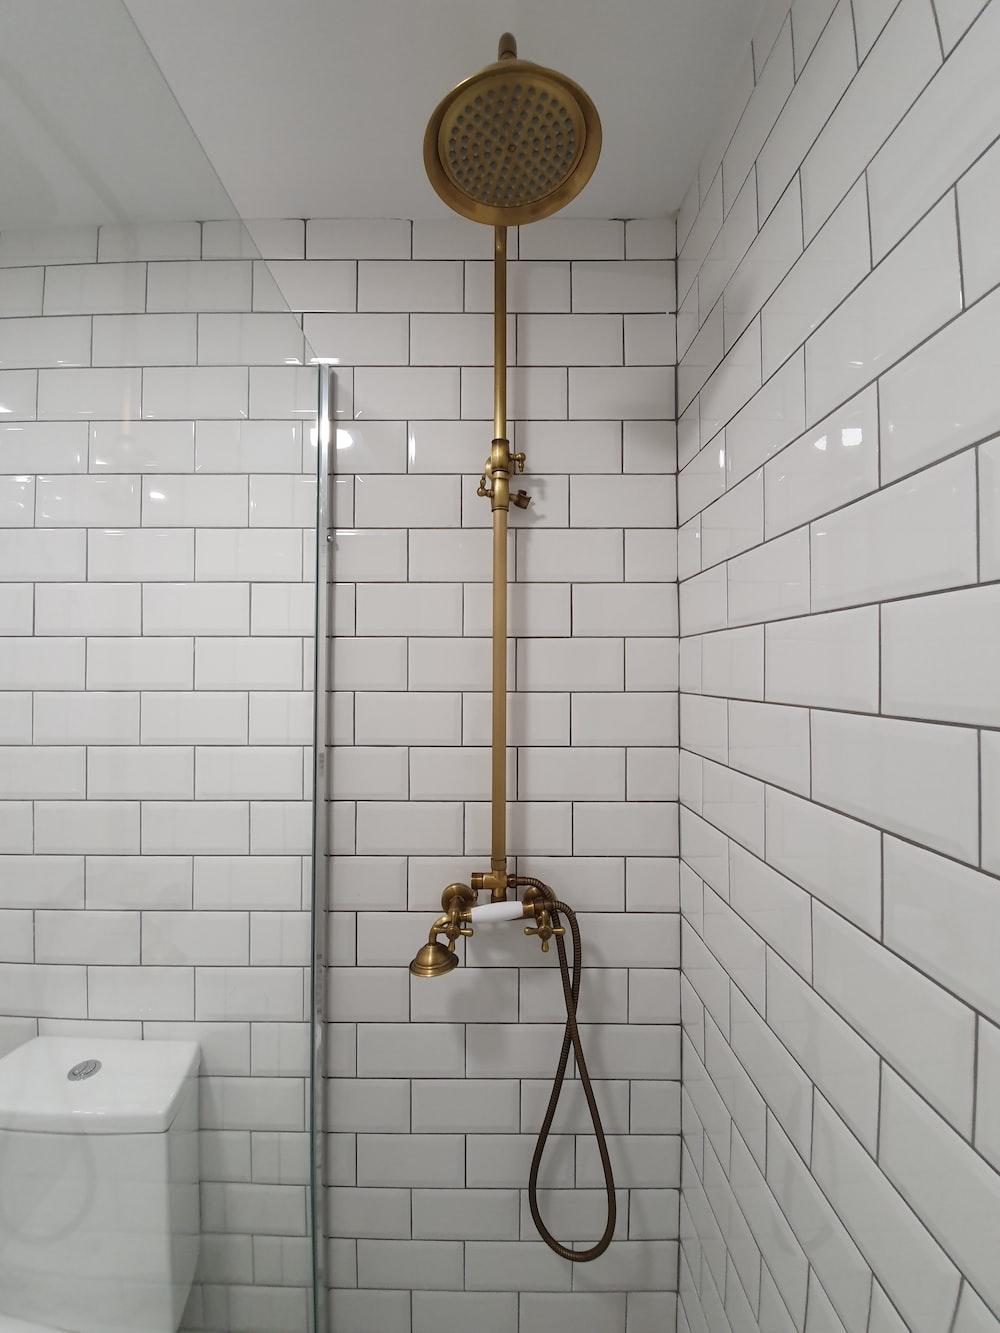 gold shower head on white ceramic bathtub